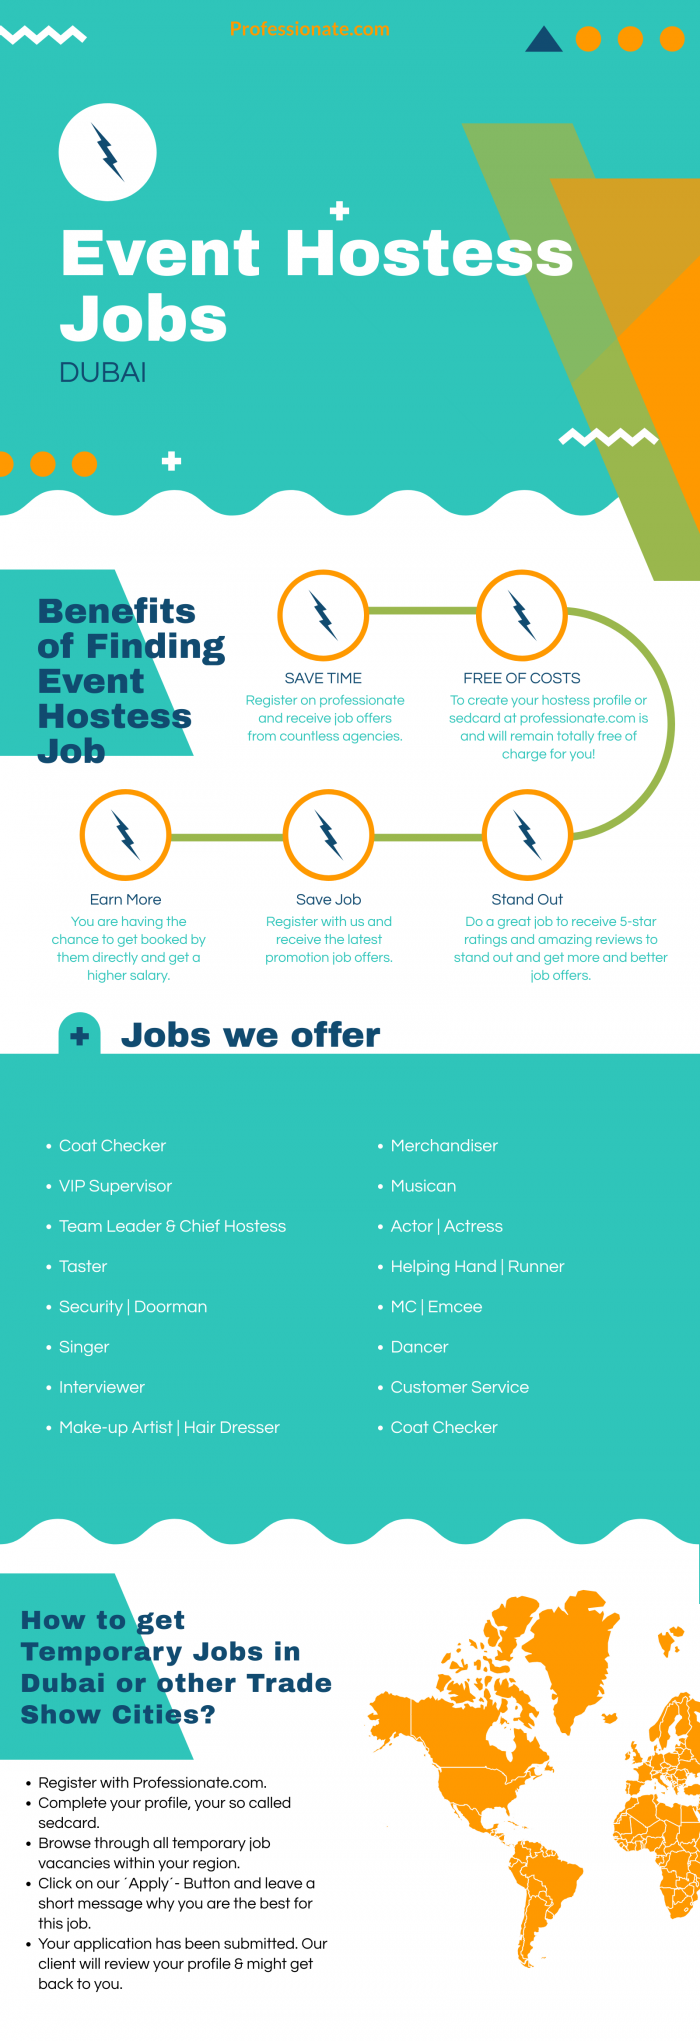 Event Hostess Jobs in Dubai